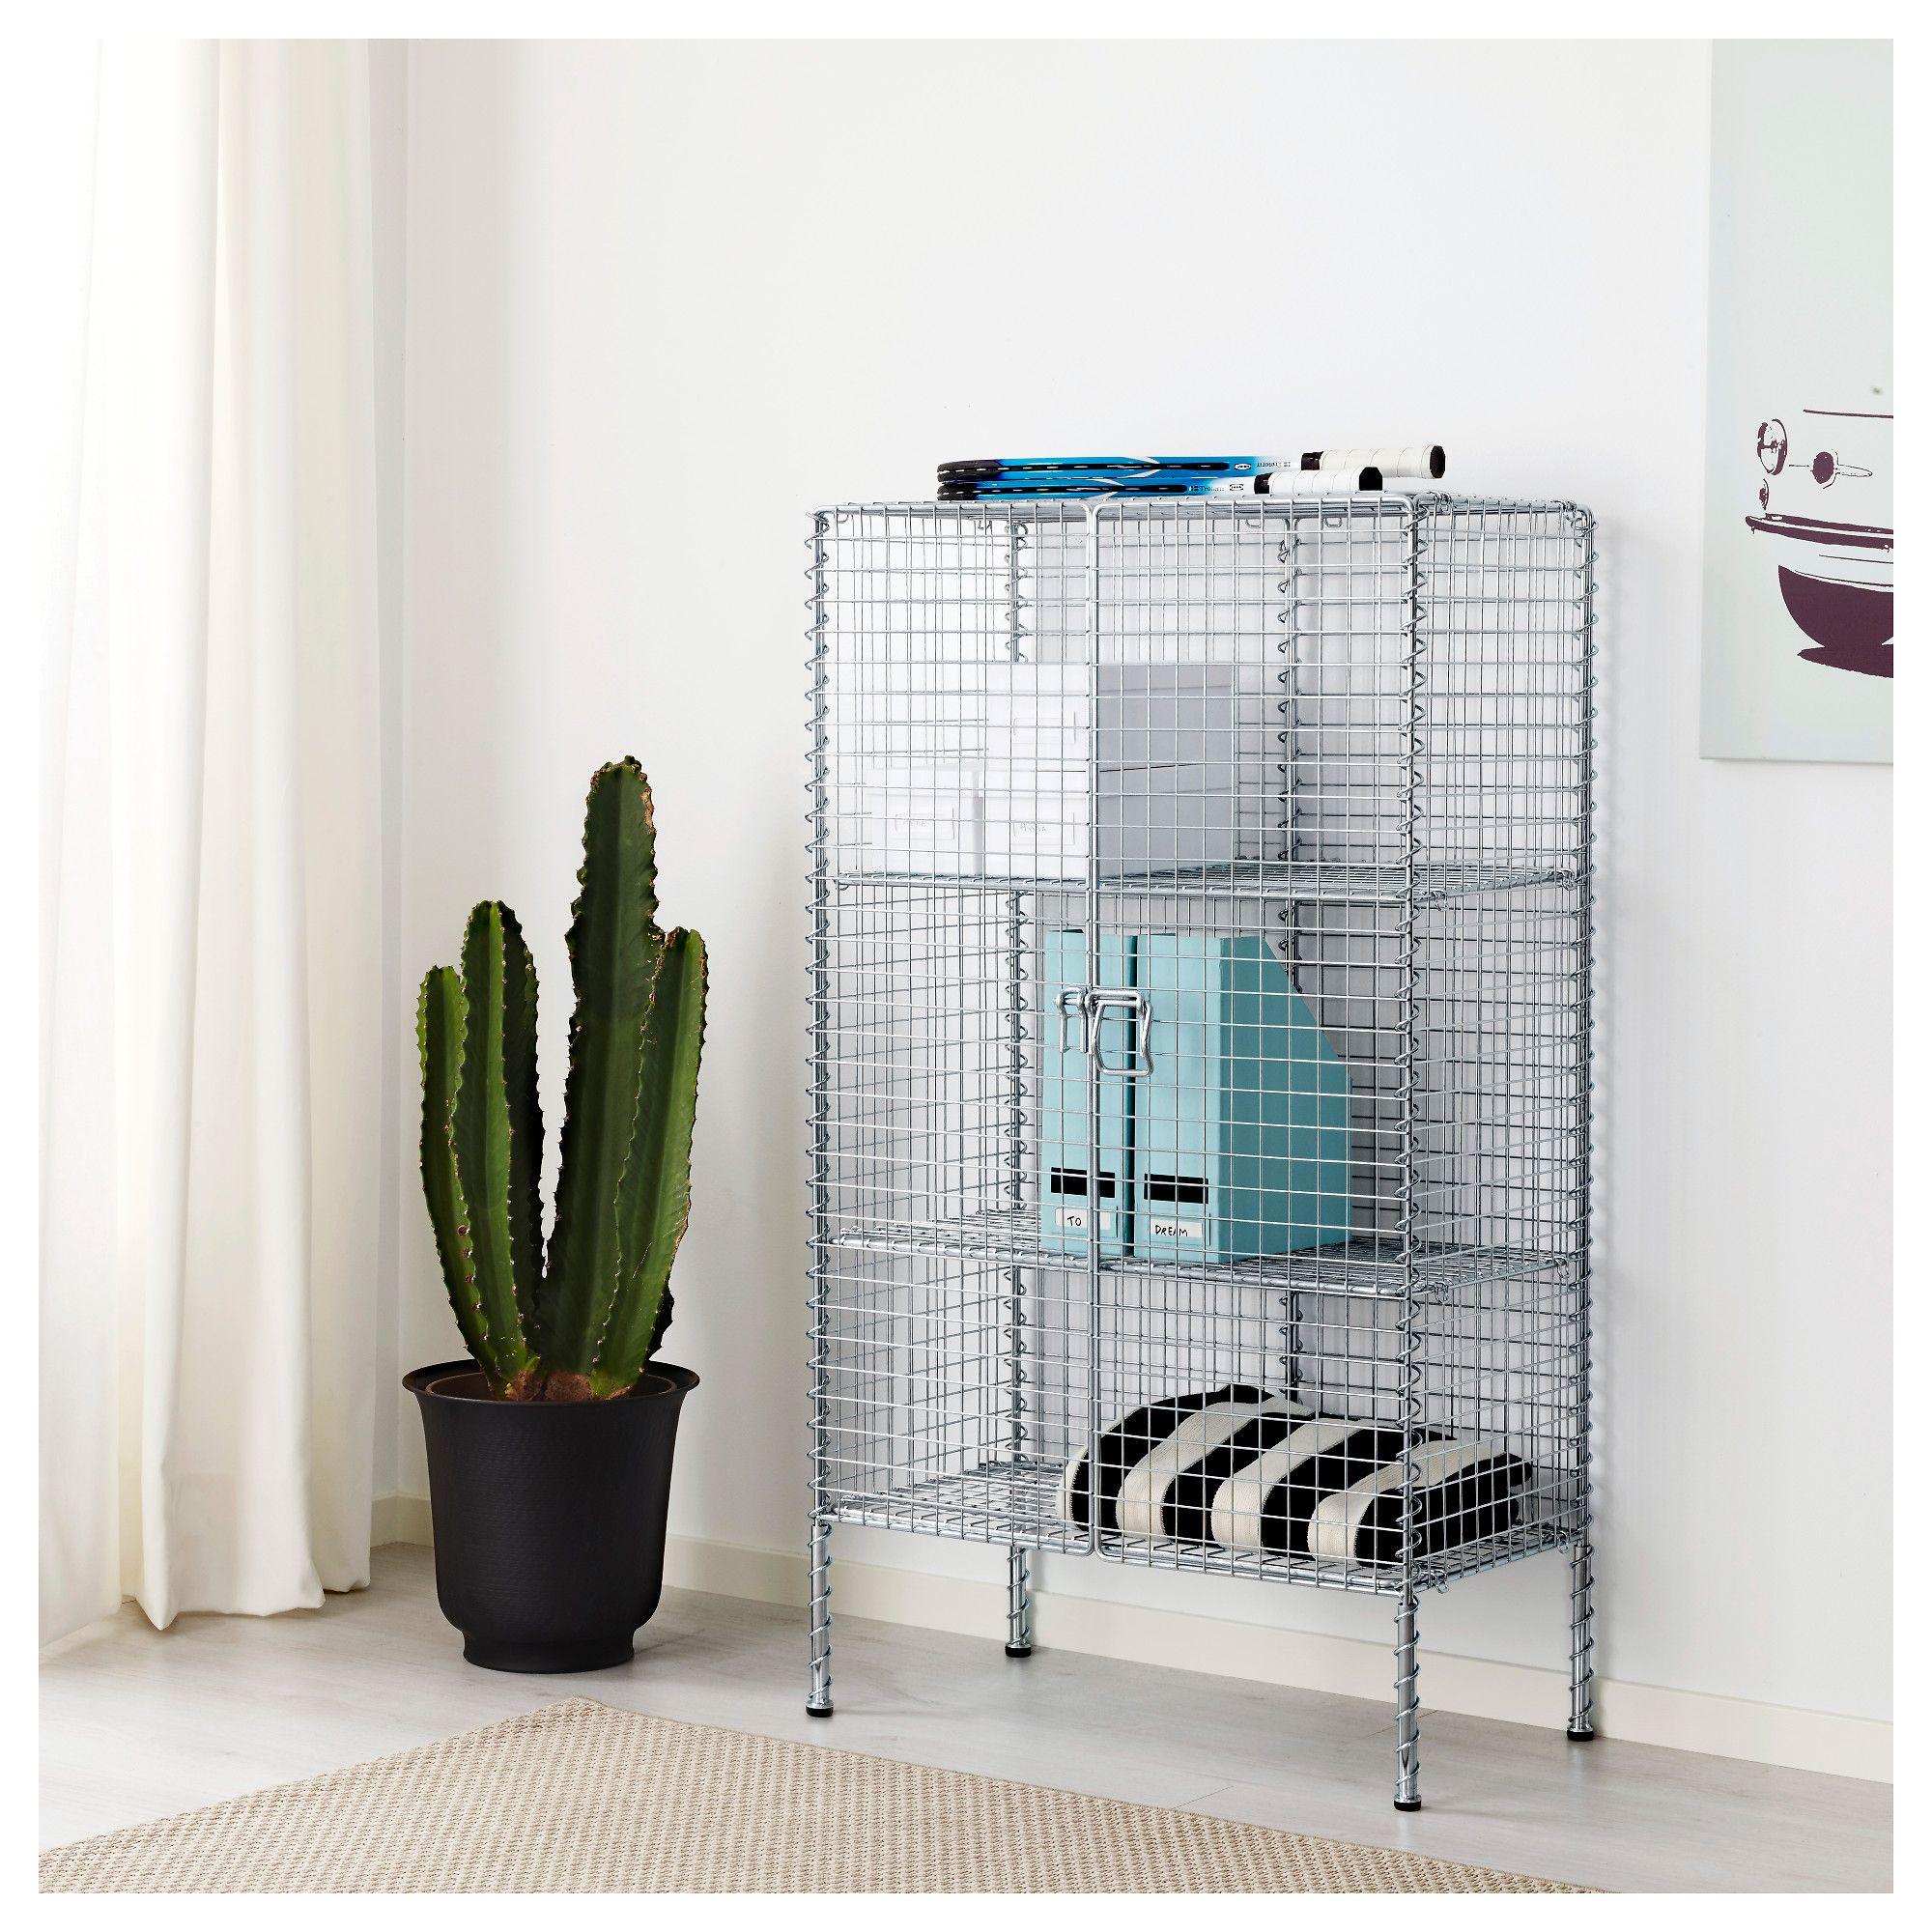 PS 2017 Storage unit 69x120 cm | Ikea ps, Ikea ikea and Storage